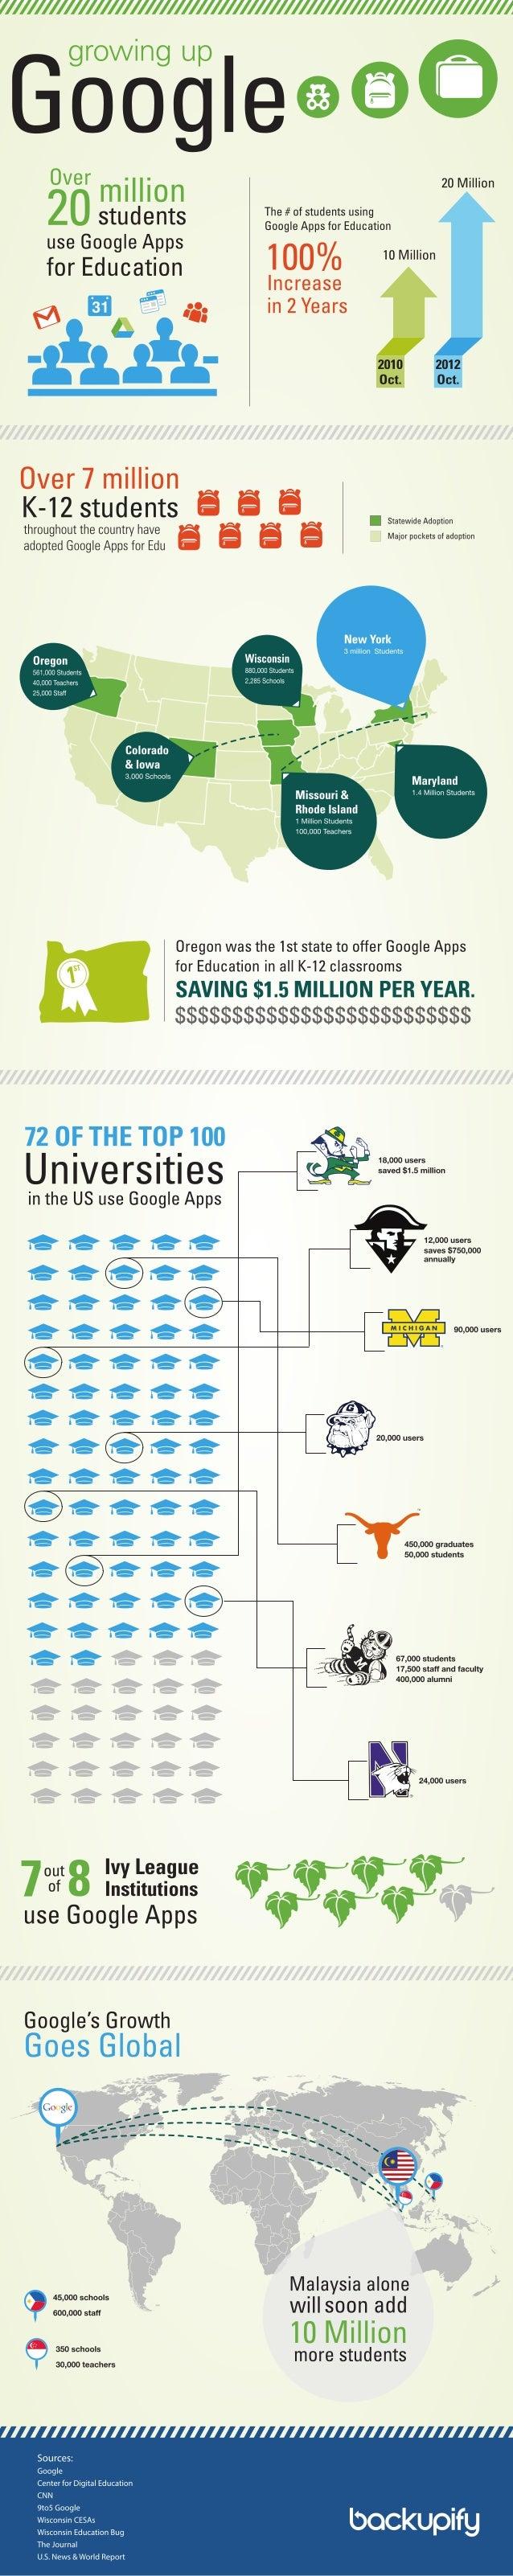 Growing Up Google - Google Apps for EDU Adoption [Infographic]